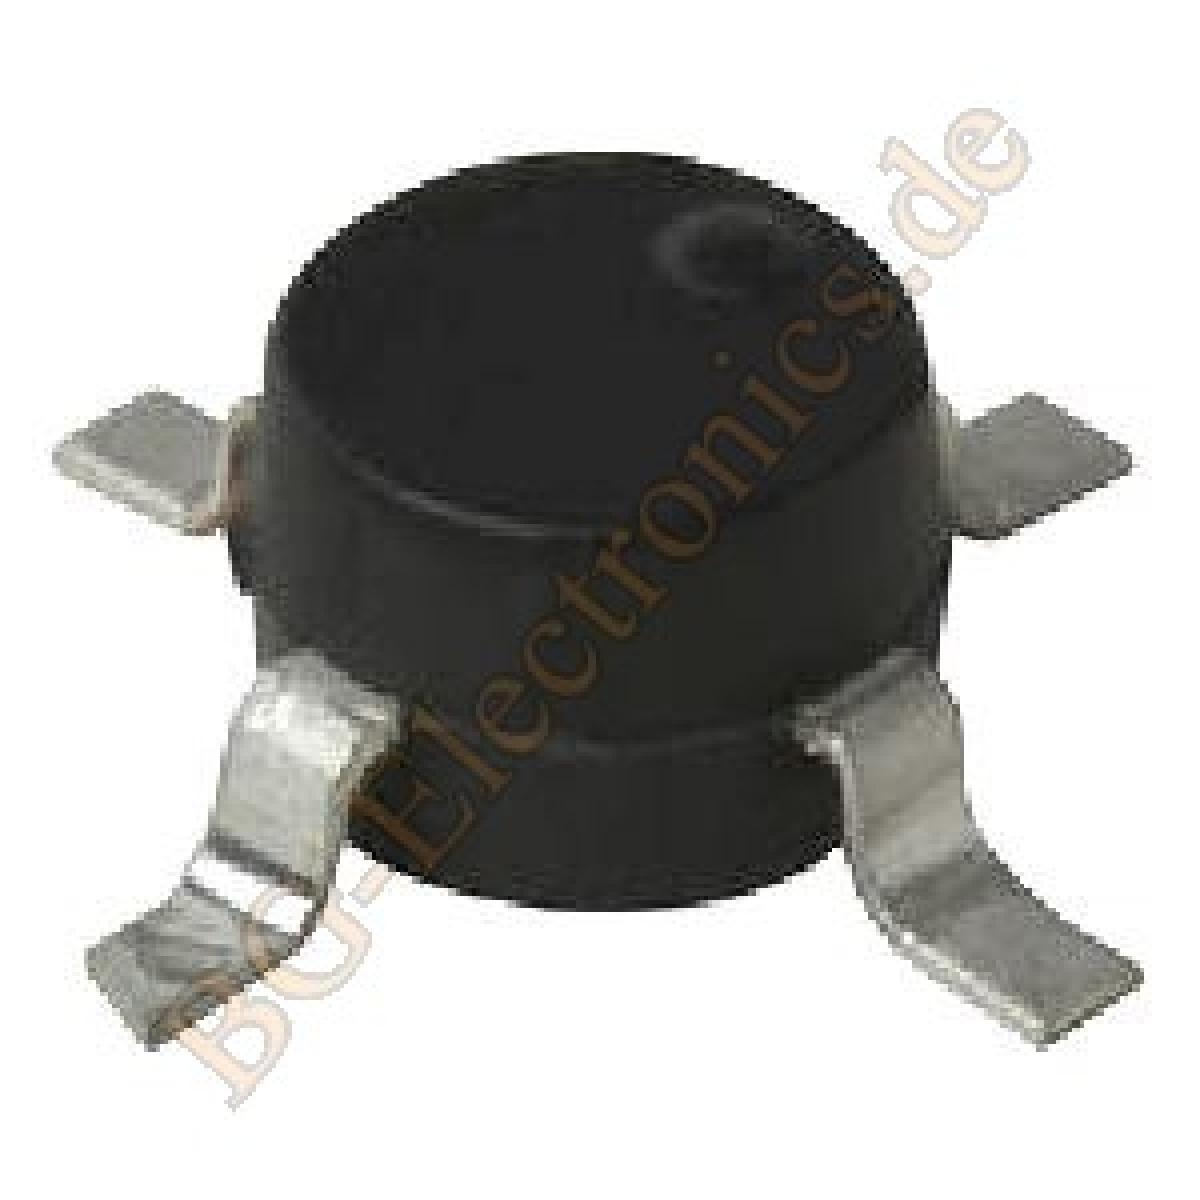 5PCS MSA-0386-TR1G A03 Encapsulation:SMT86,MMIC SI BIPOLAR 86SMD PLAST